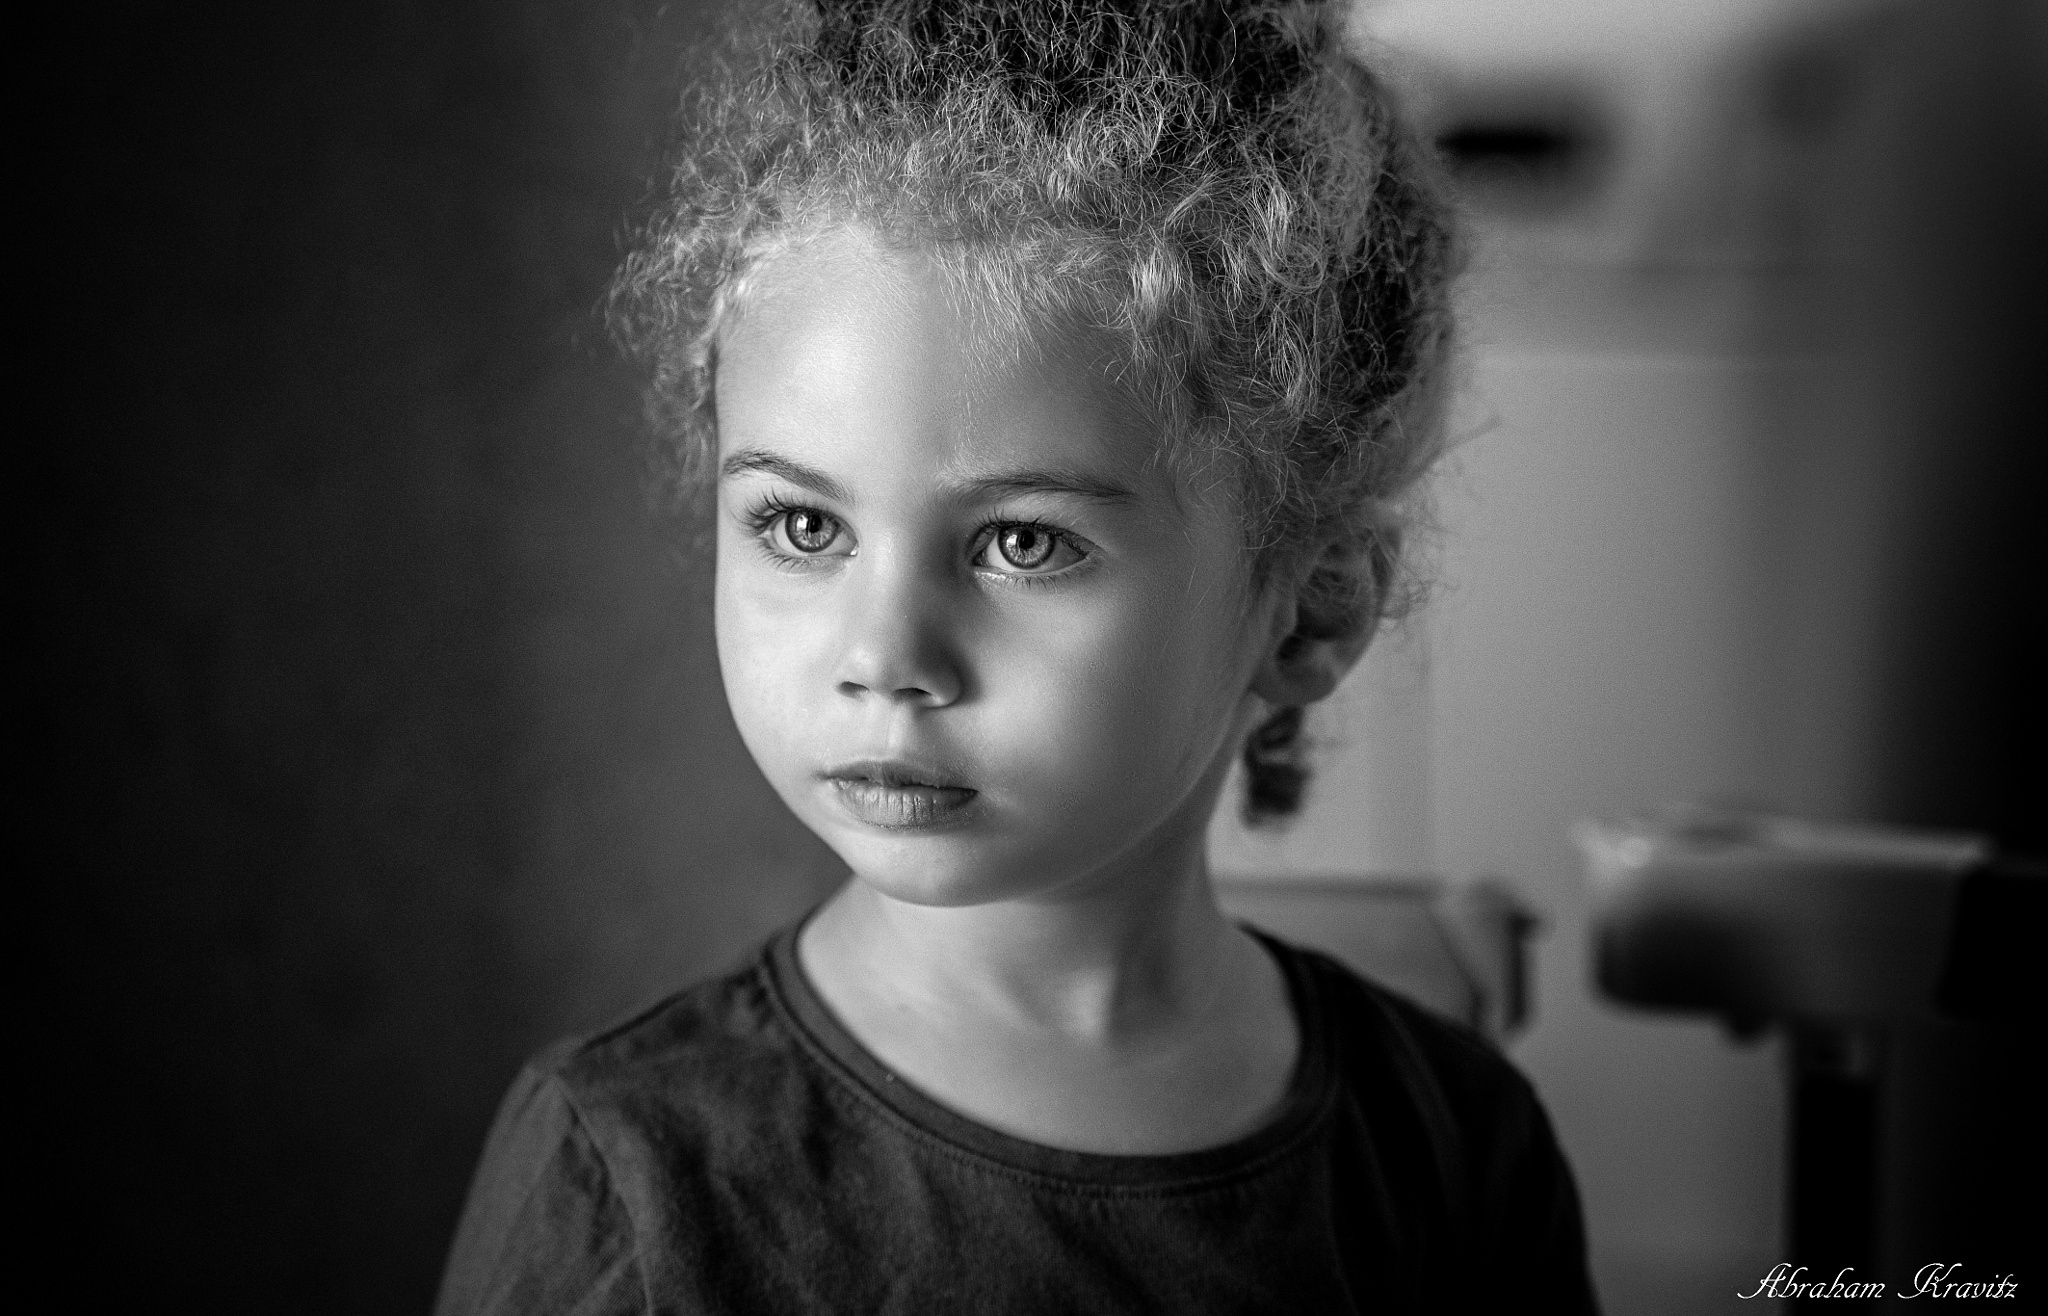 Photograph Maïssa Blue by Abraham Kravitz on 500px